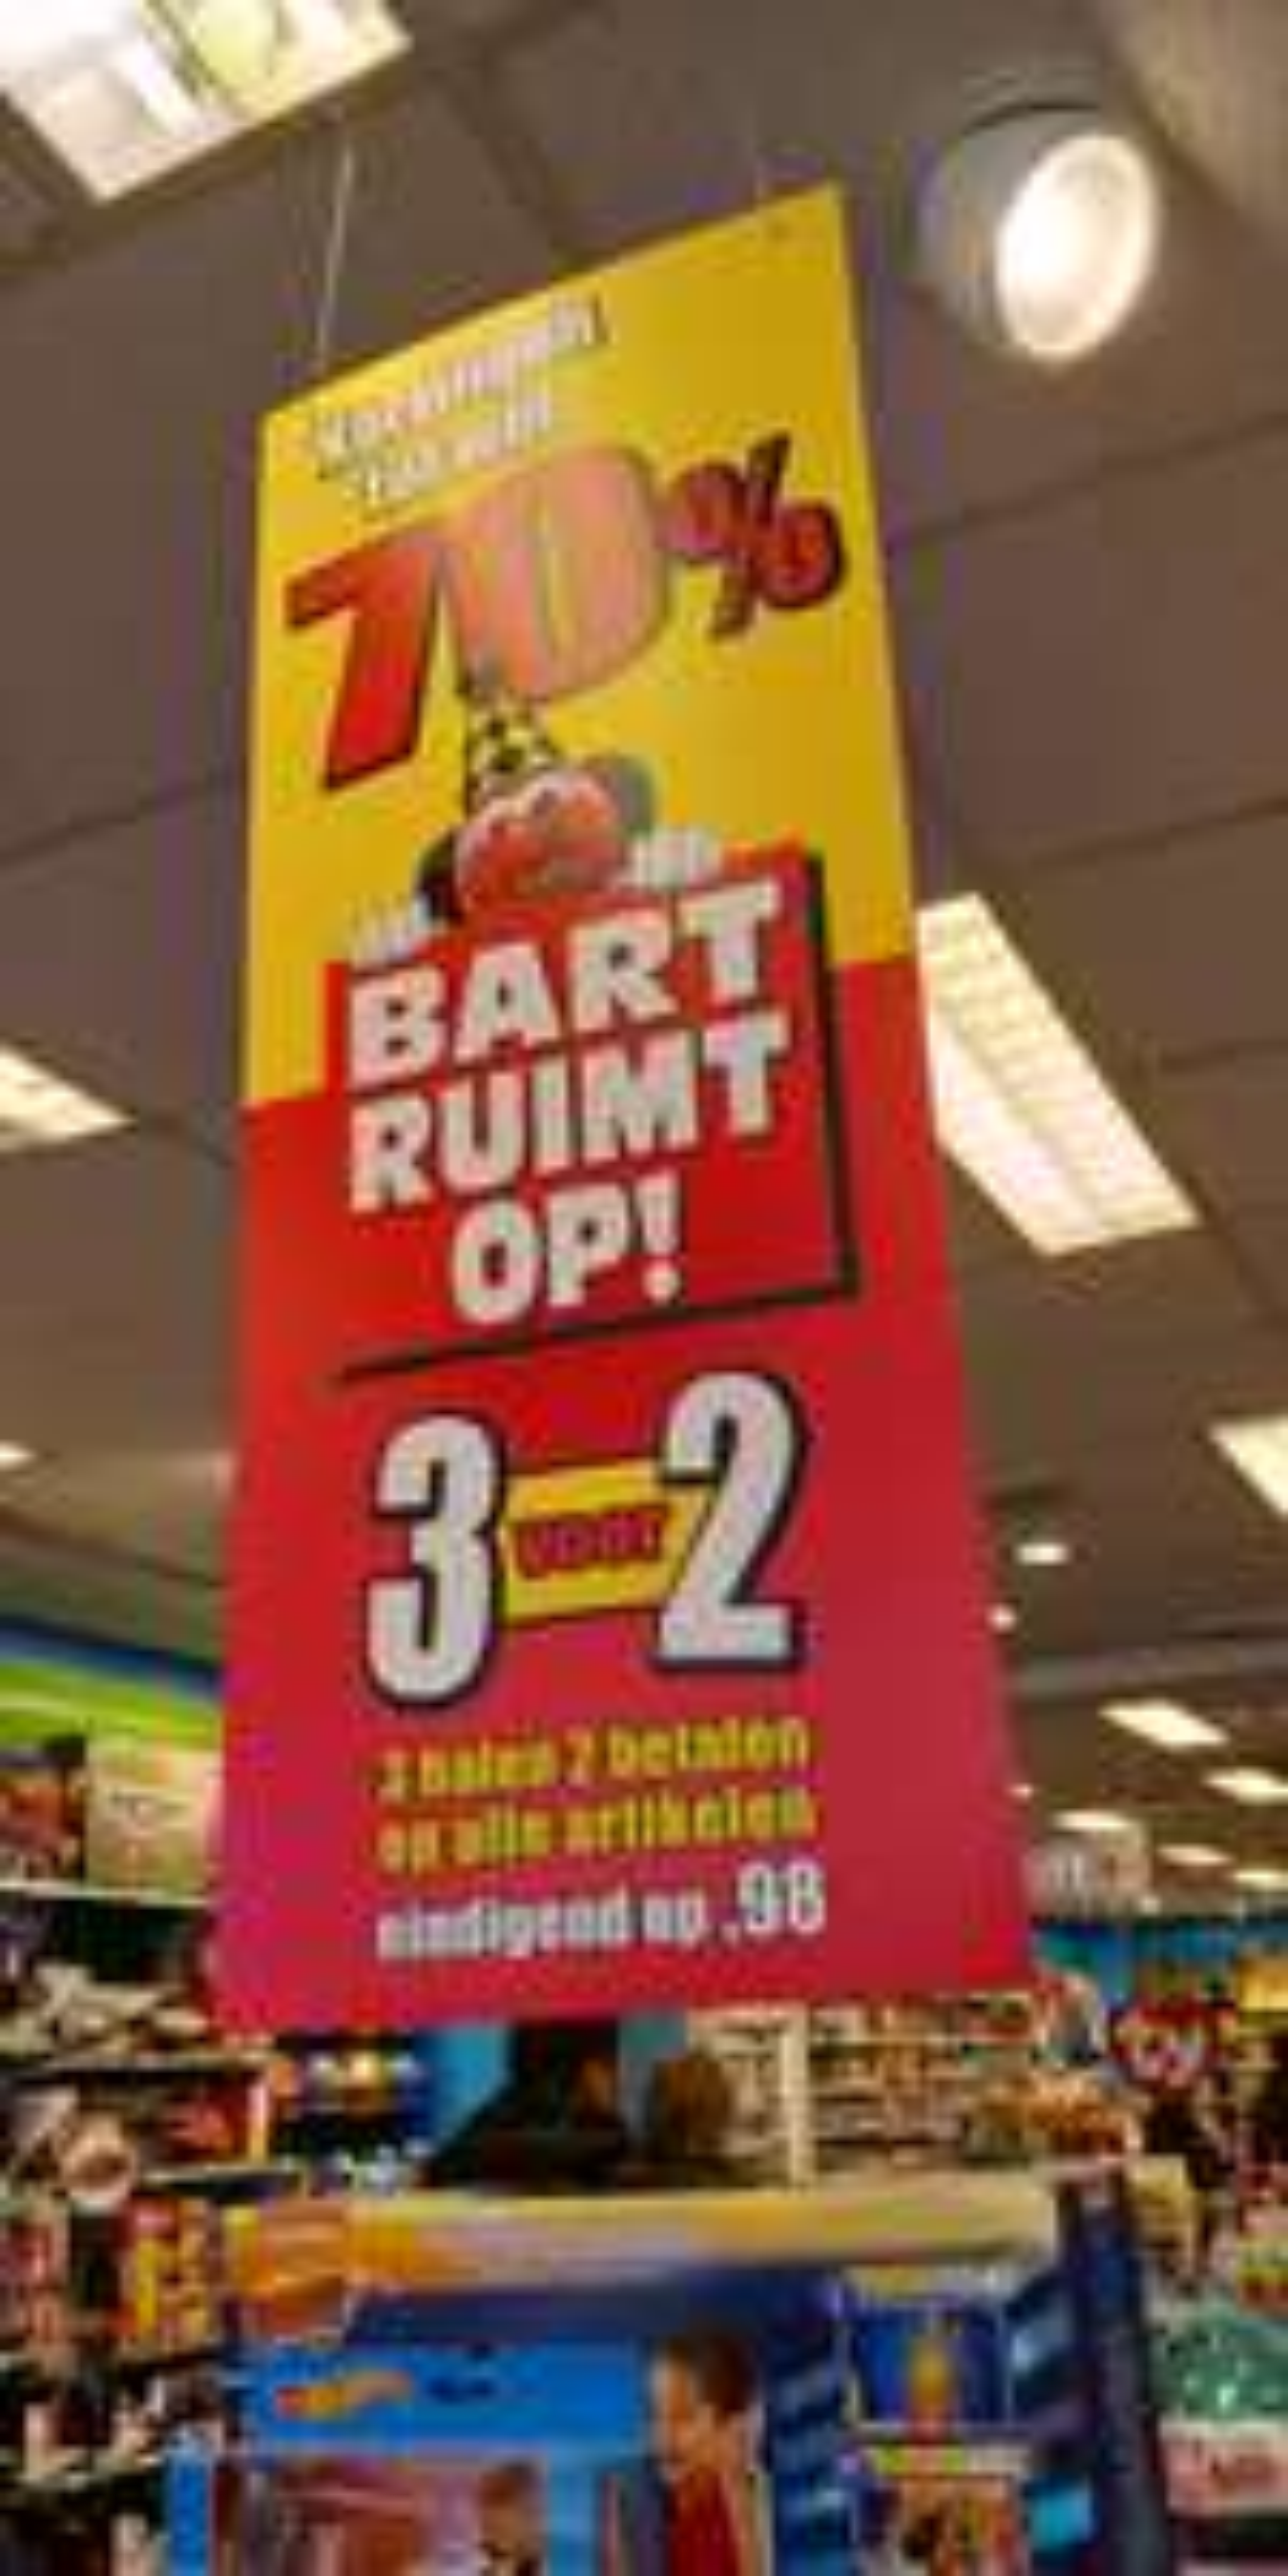 3 halen 2 betalen op alle prijzen die eindigen op ,98 @ Bart Smit